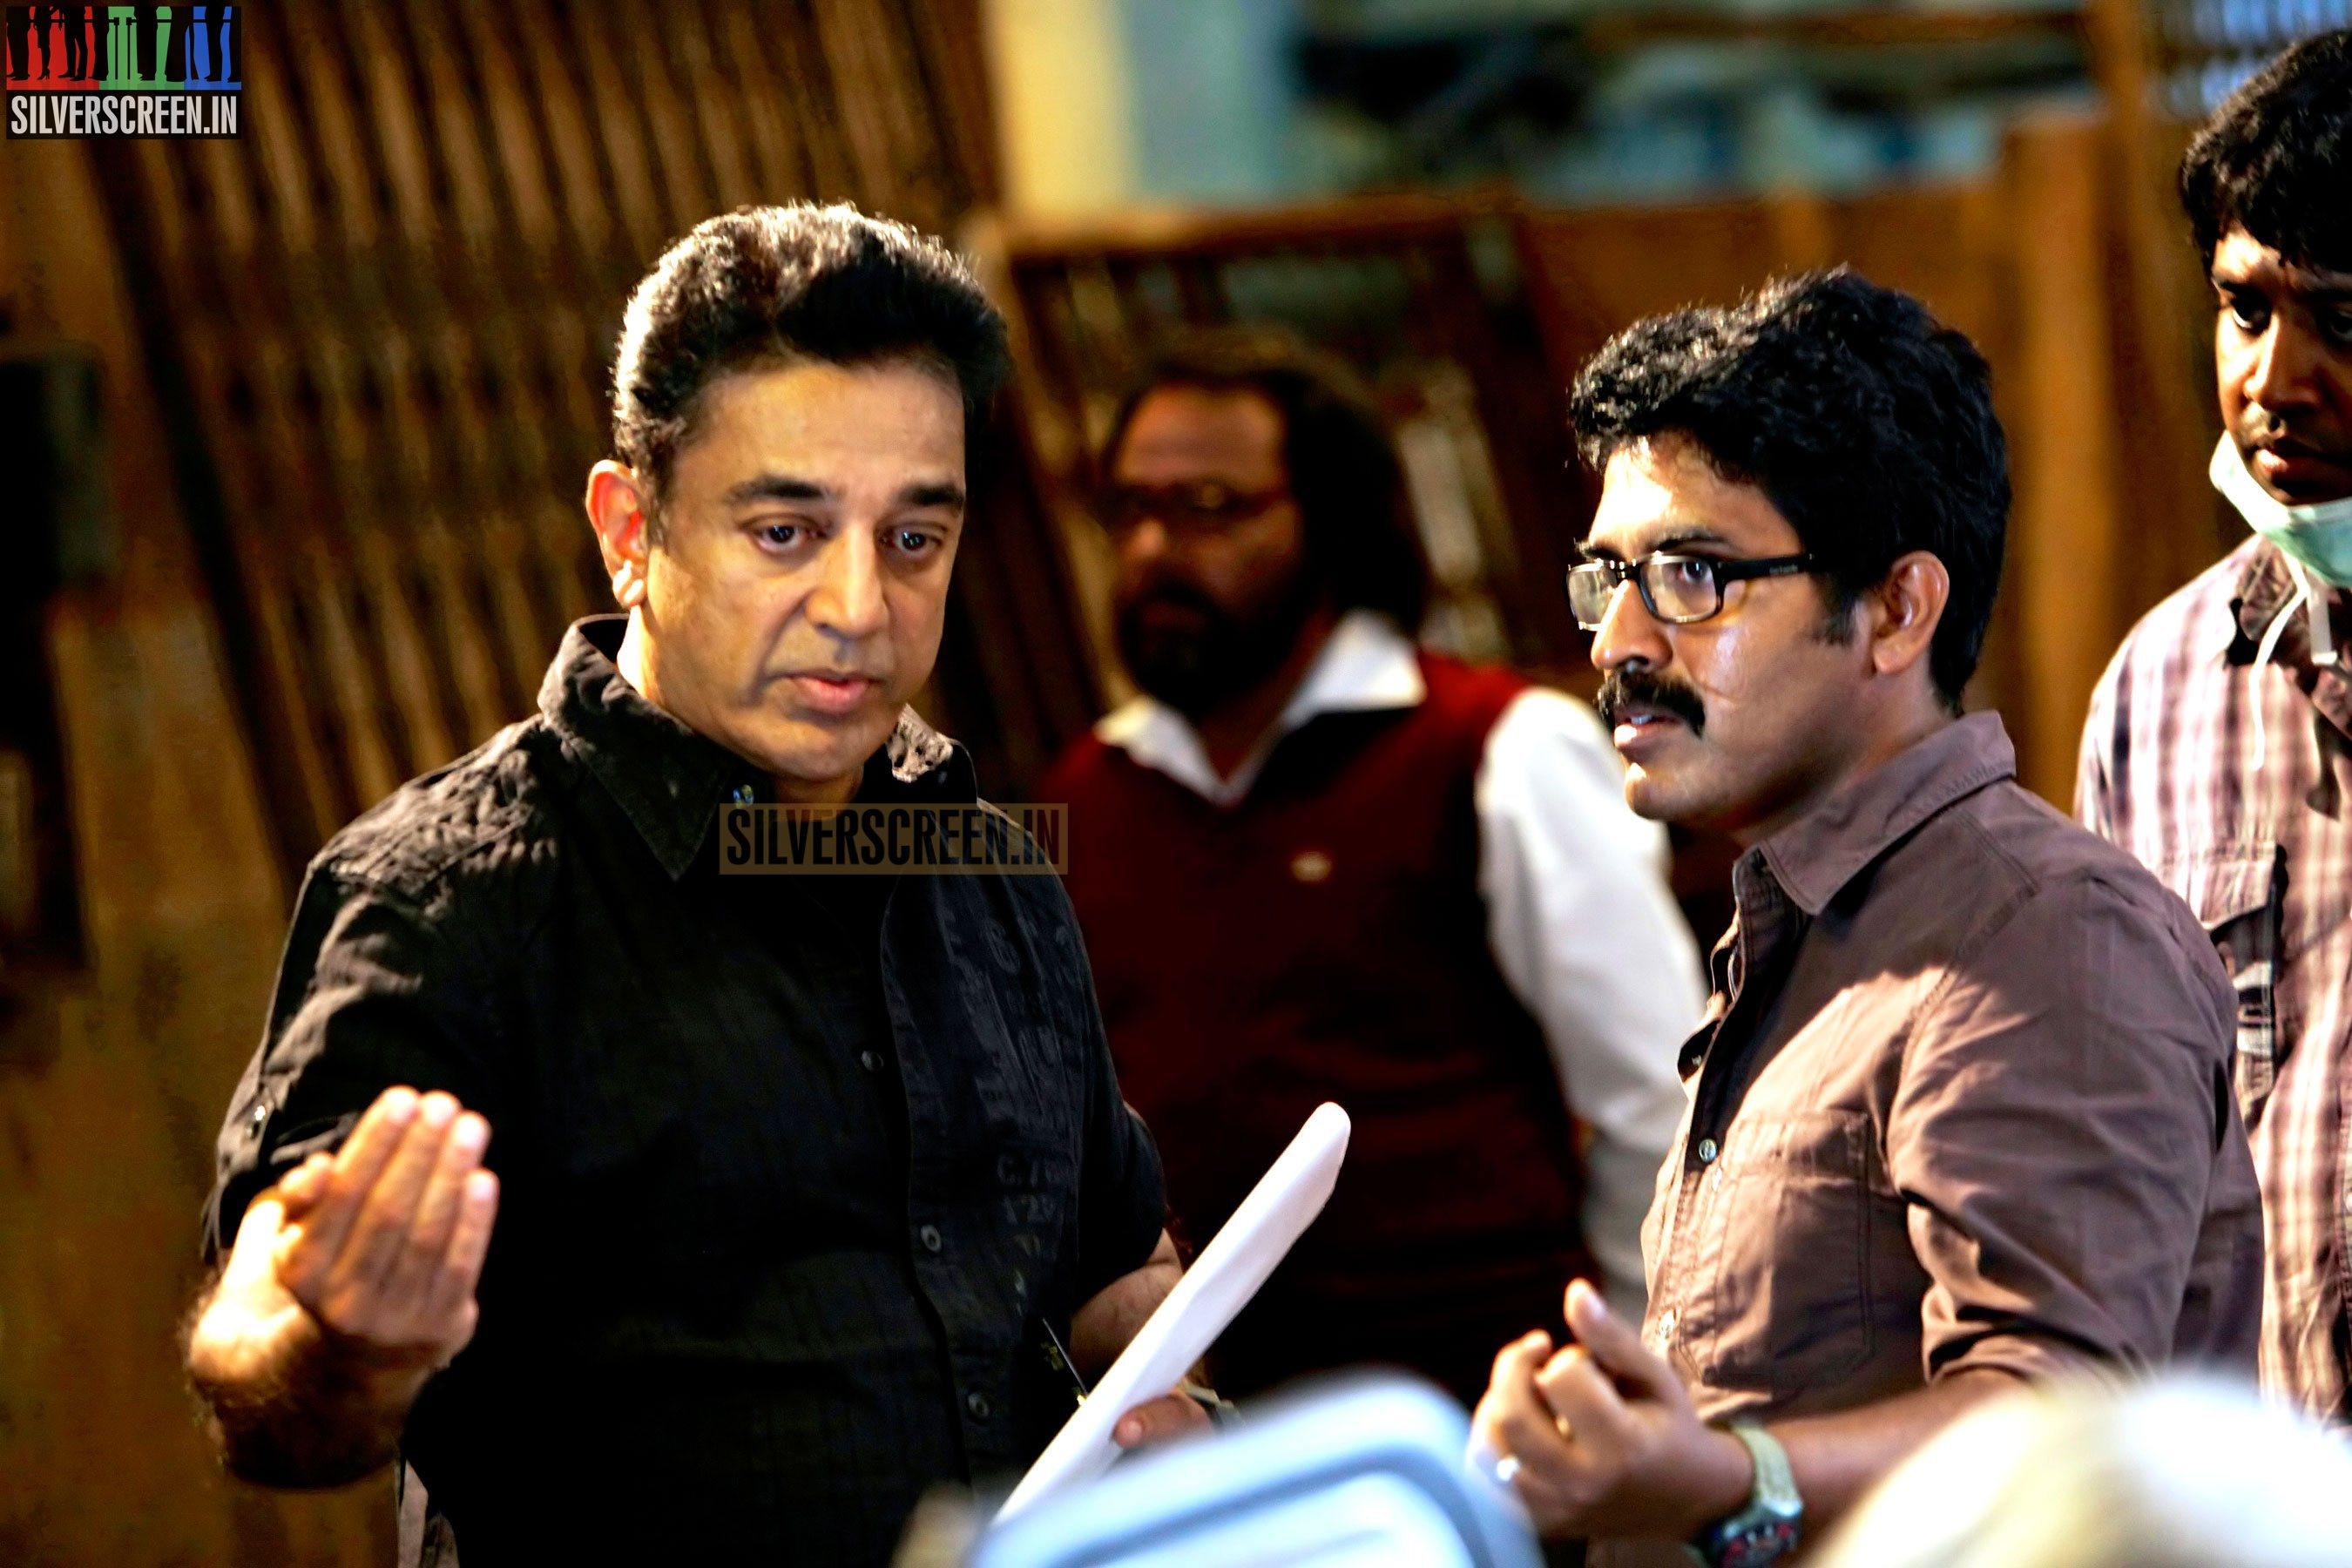 Cinematographer Shamdat Sainudeen